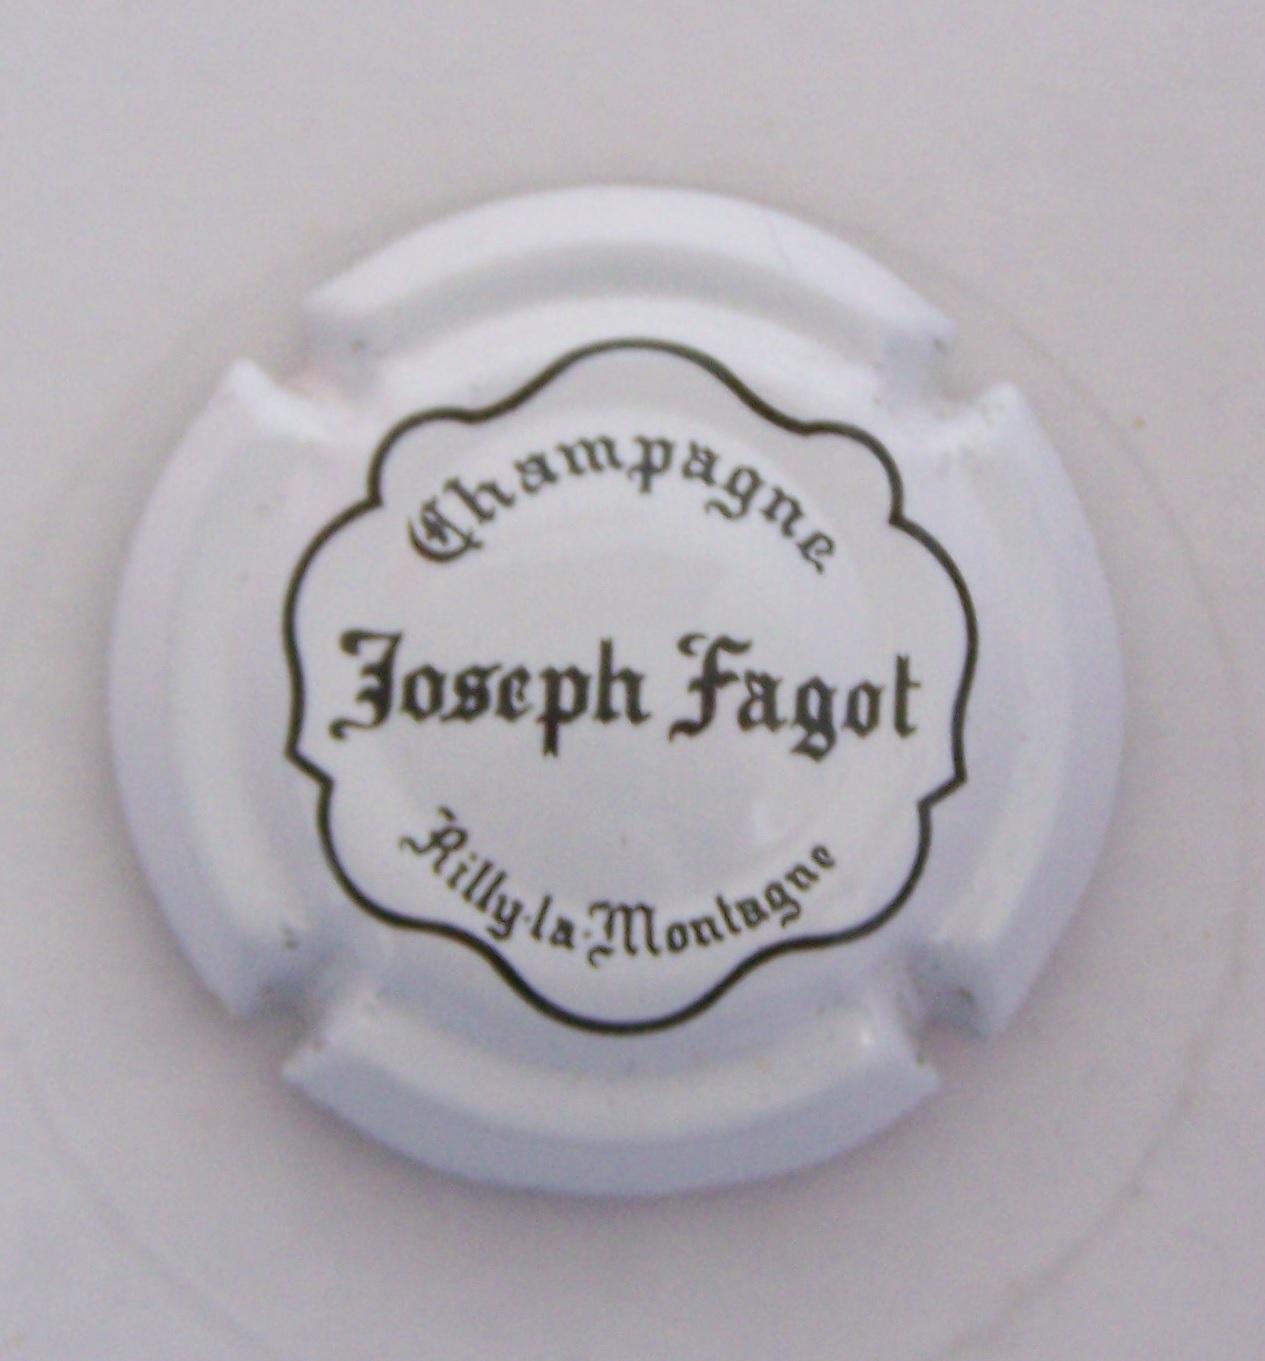 CAPSULE DE CHAMPAGNE FAGOT*